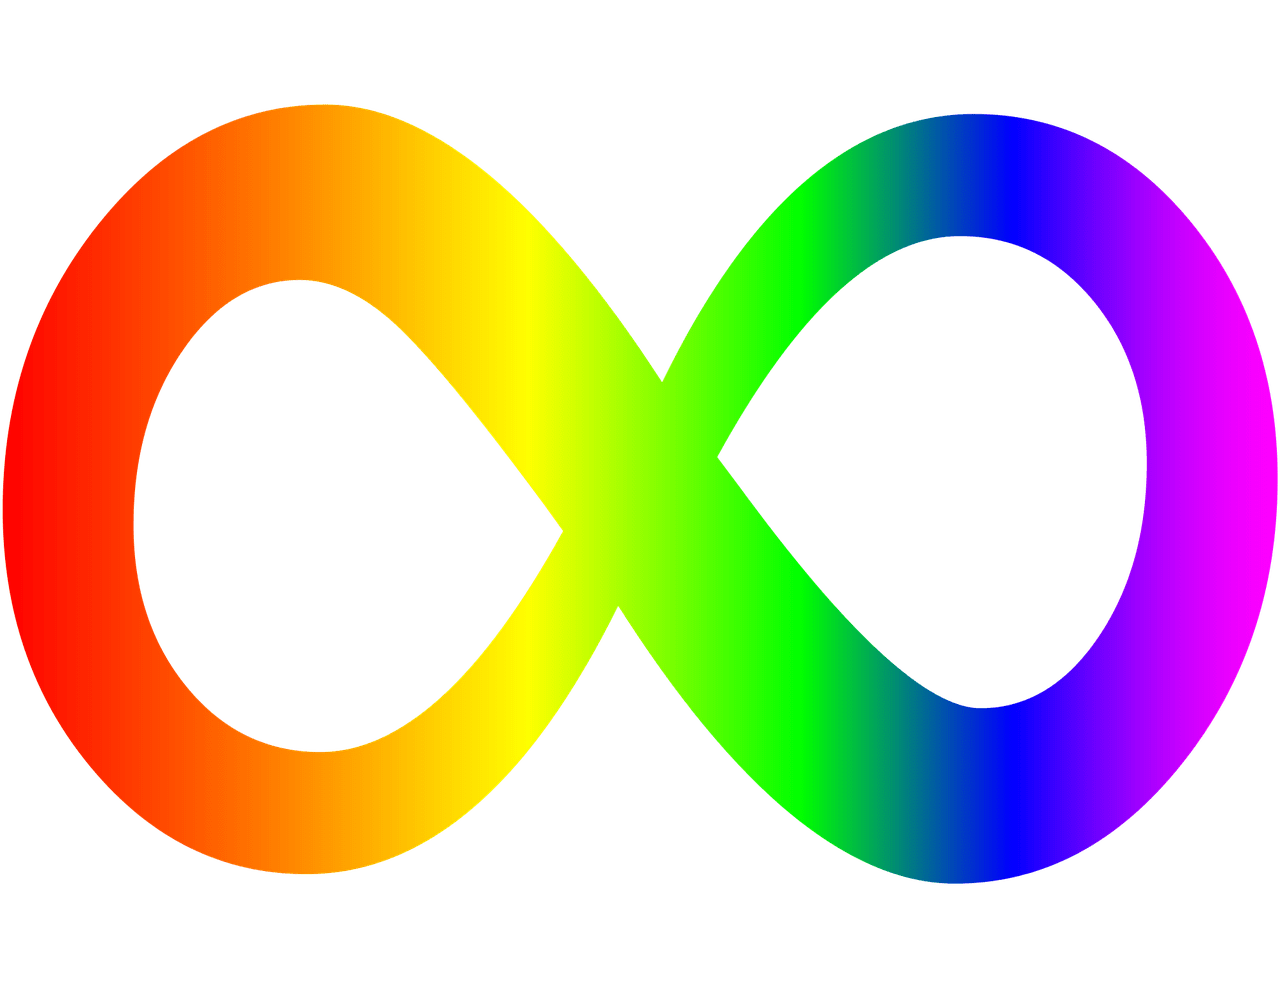 Infinity Symbol Rainbow Transparent Png Stickpng